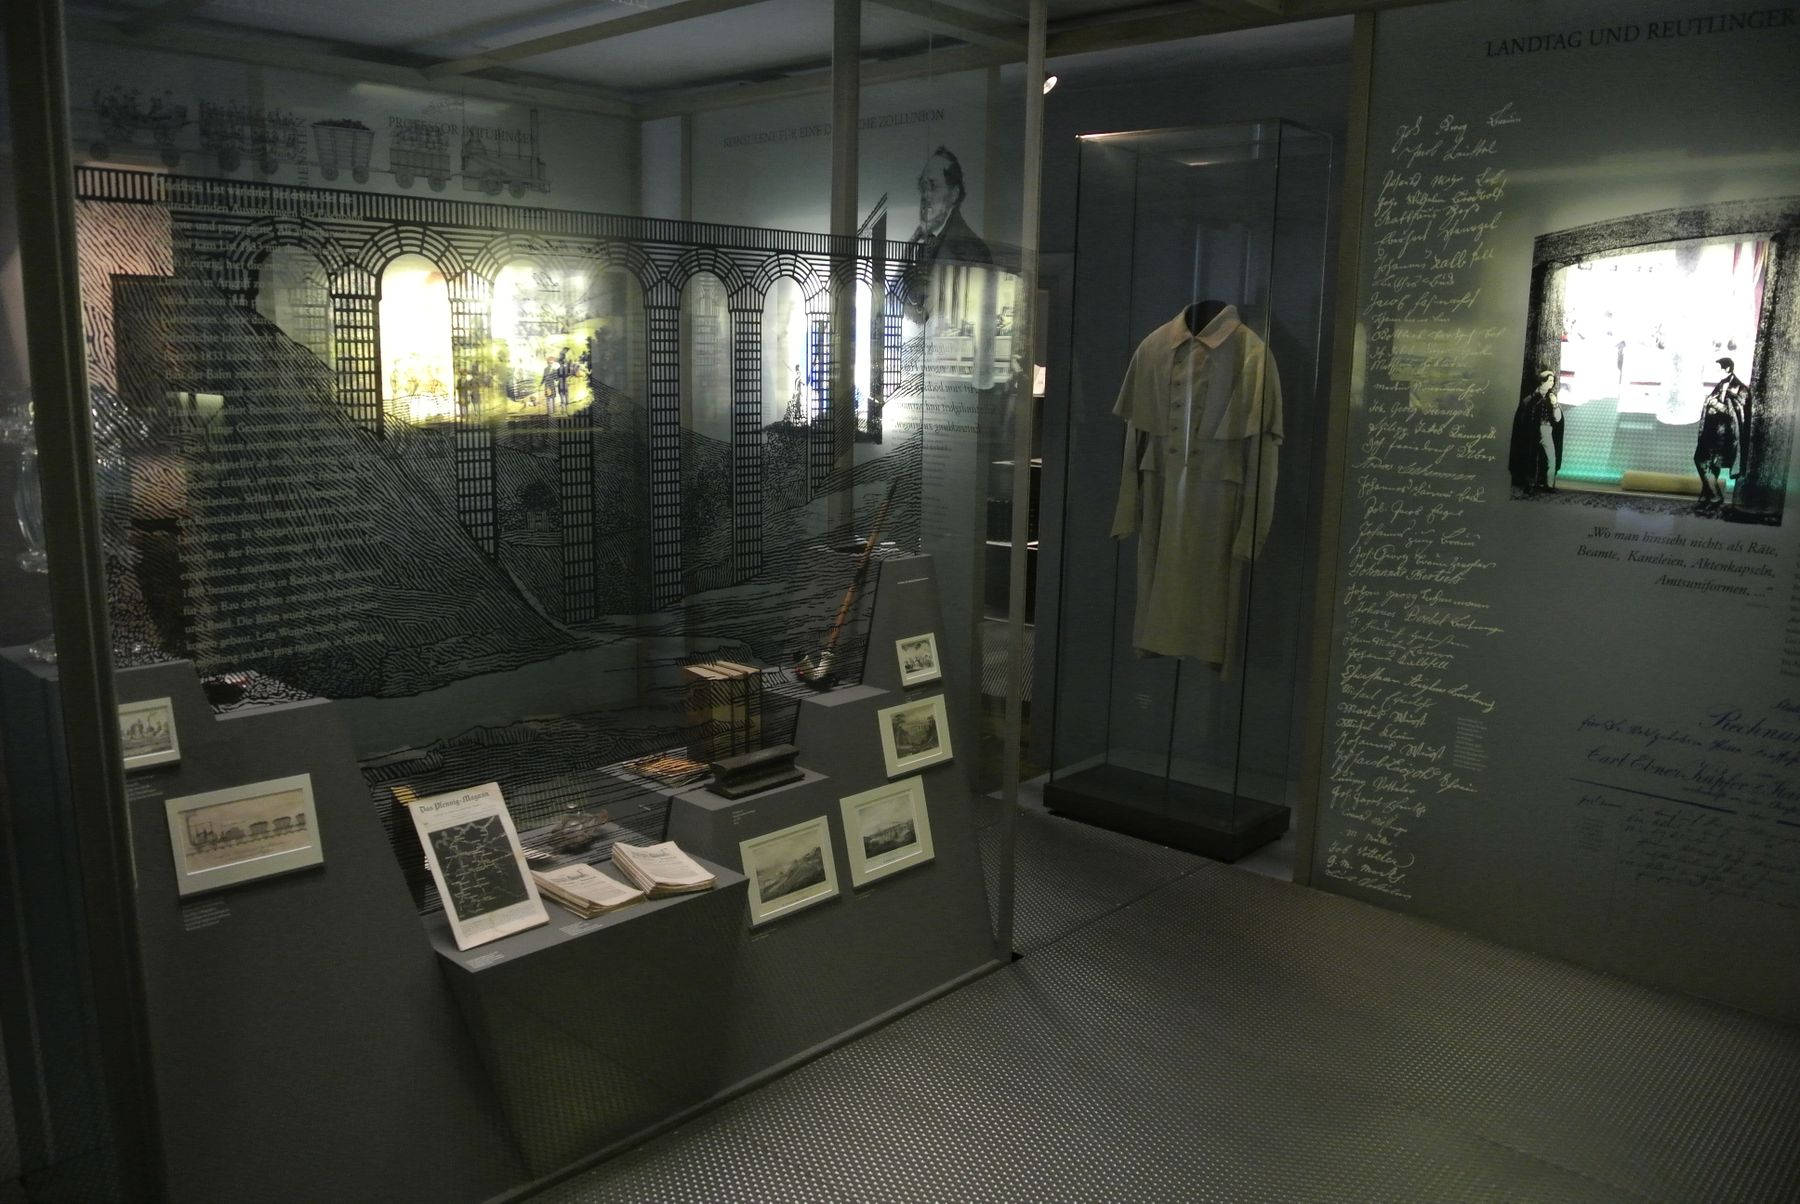 Himatmuseum Reutlingen, Friedrich List